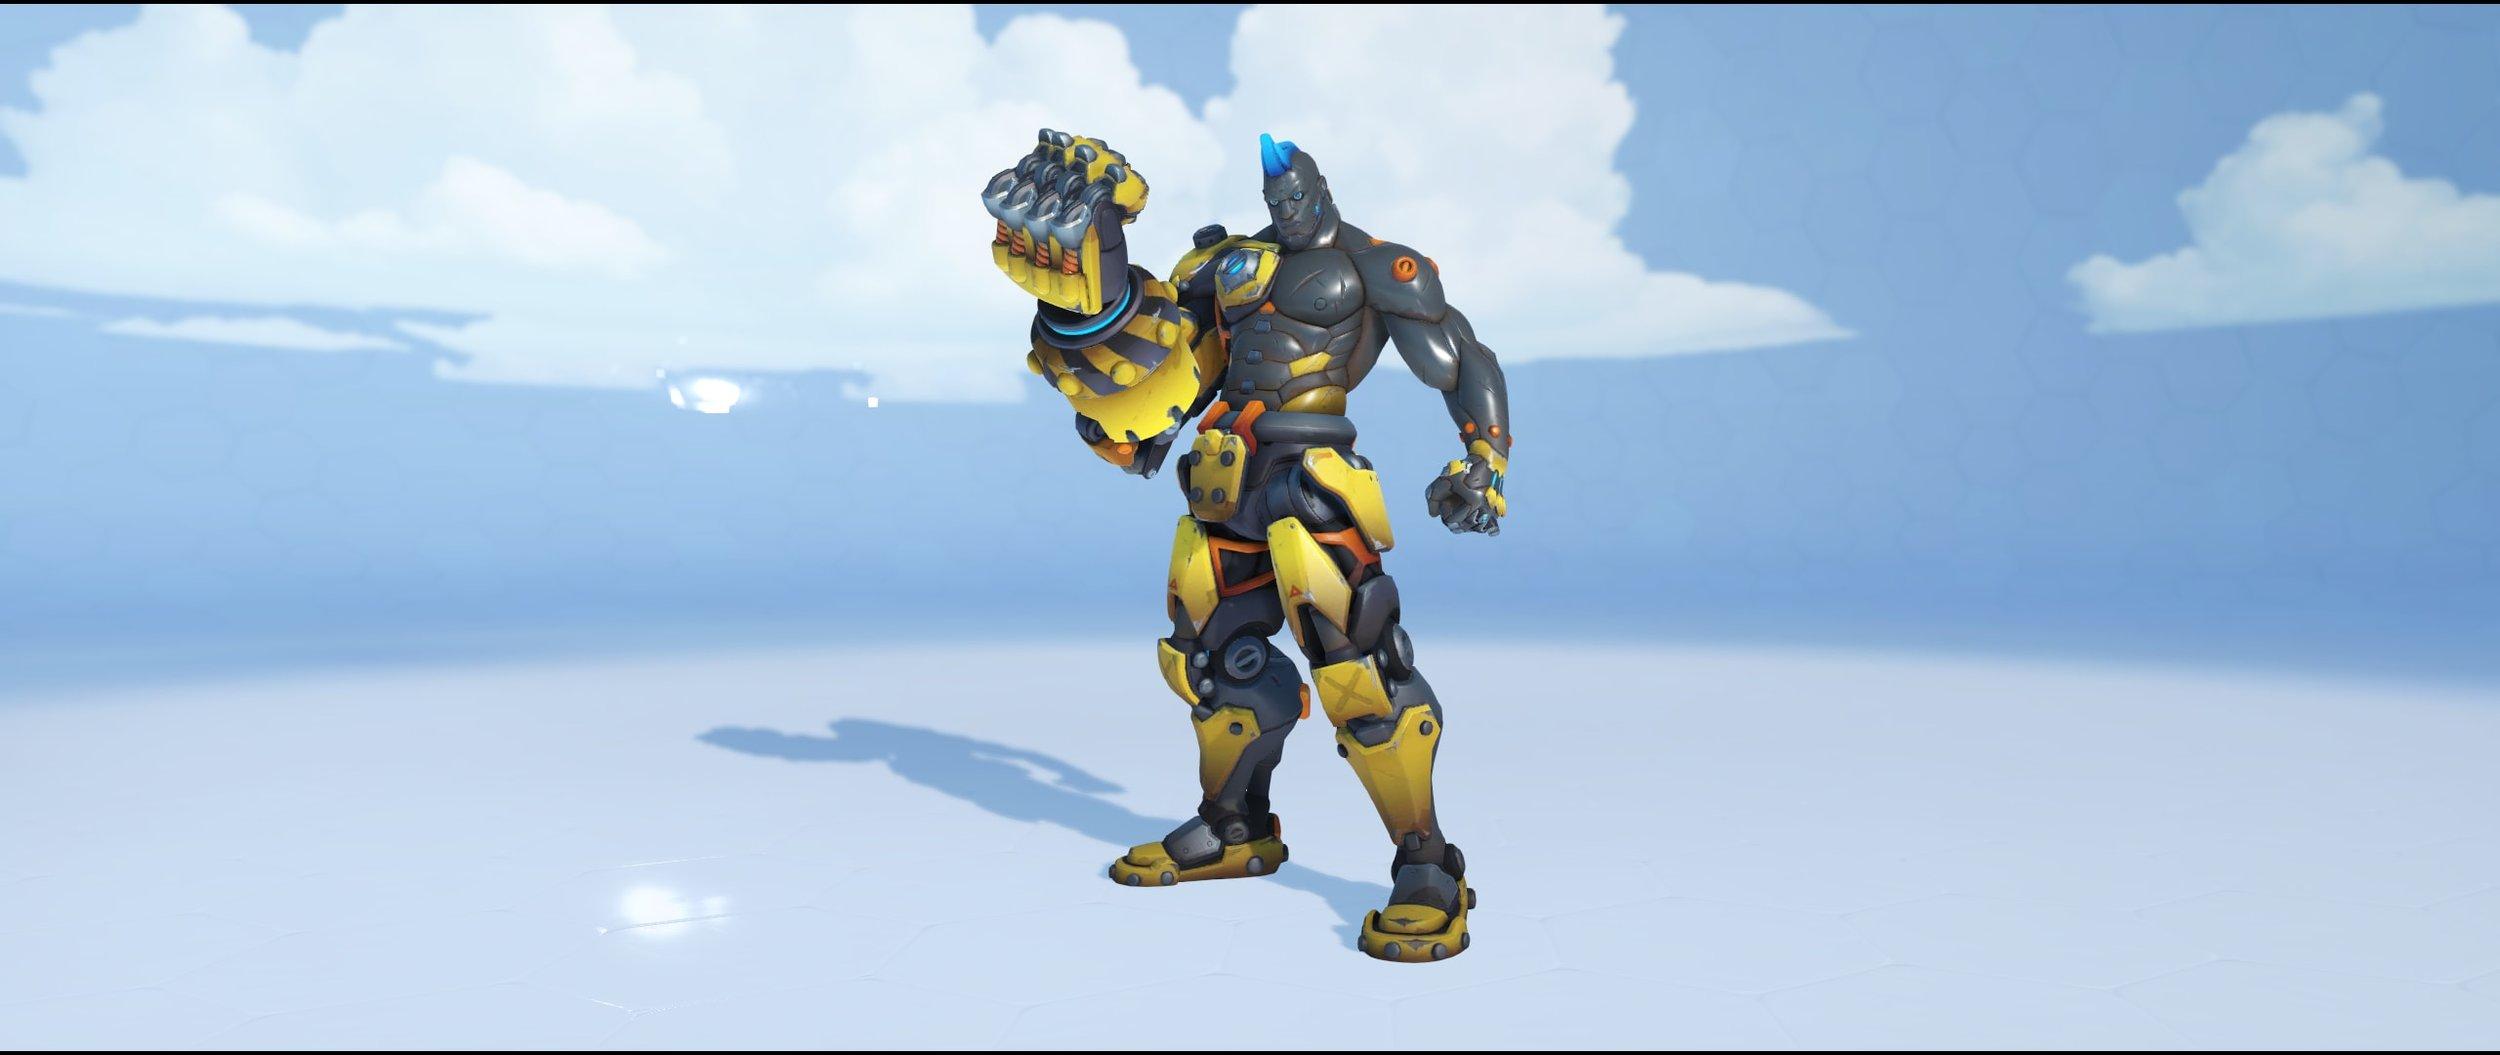 Caution front legendary skin Doomfist Overwatch.jpg